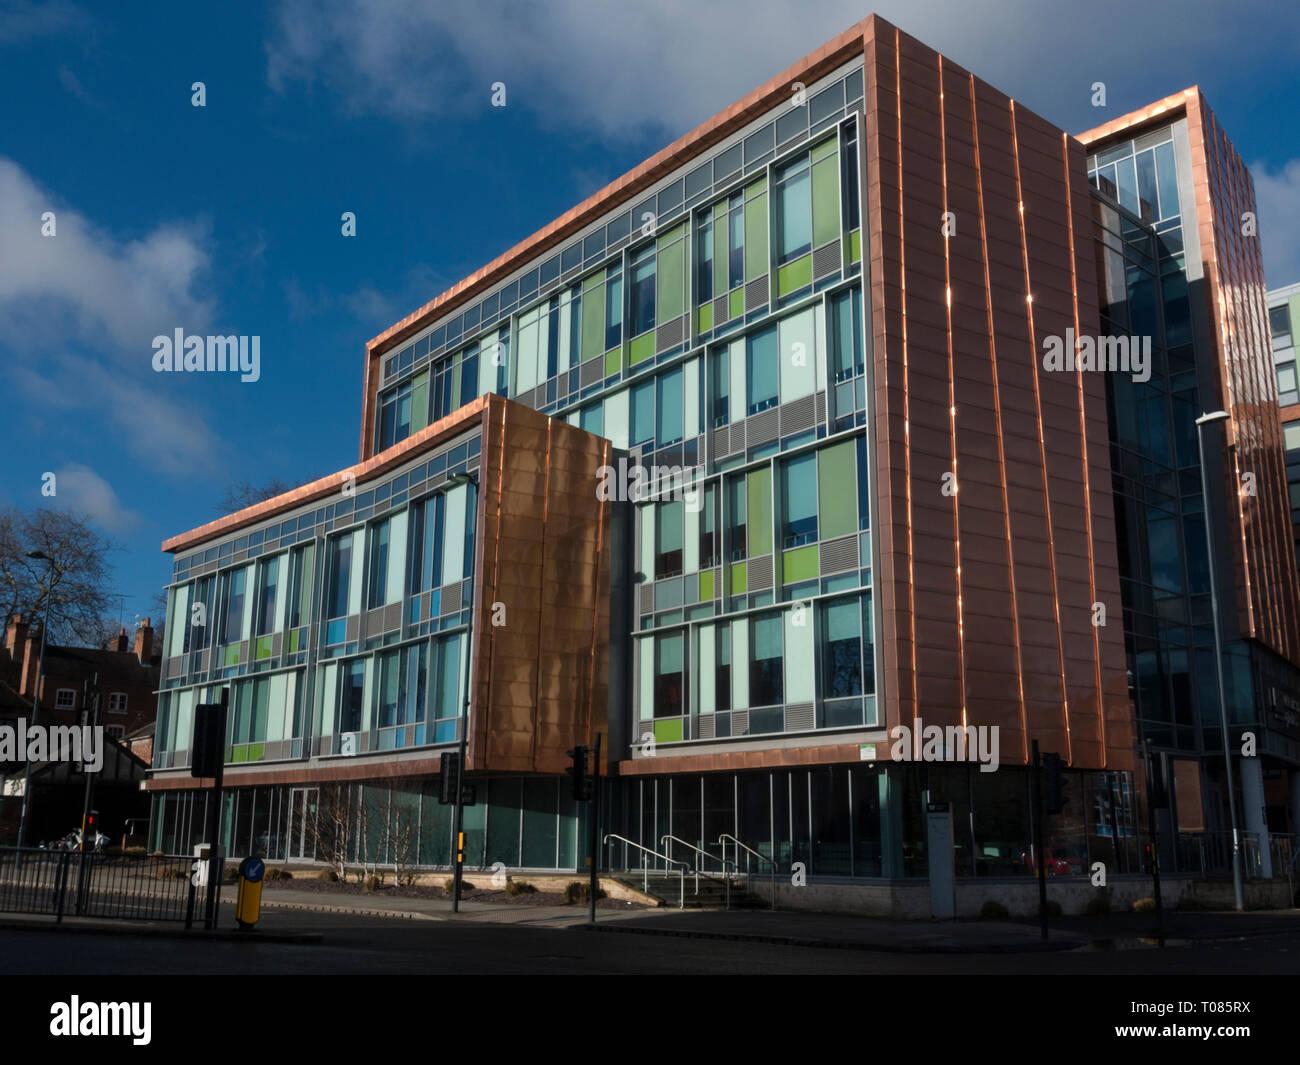 Derby Student Halls - Stock Image